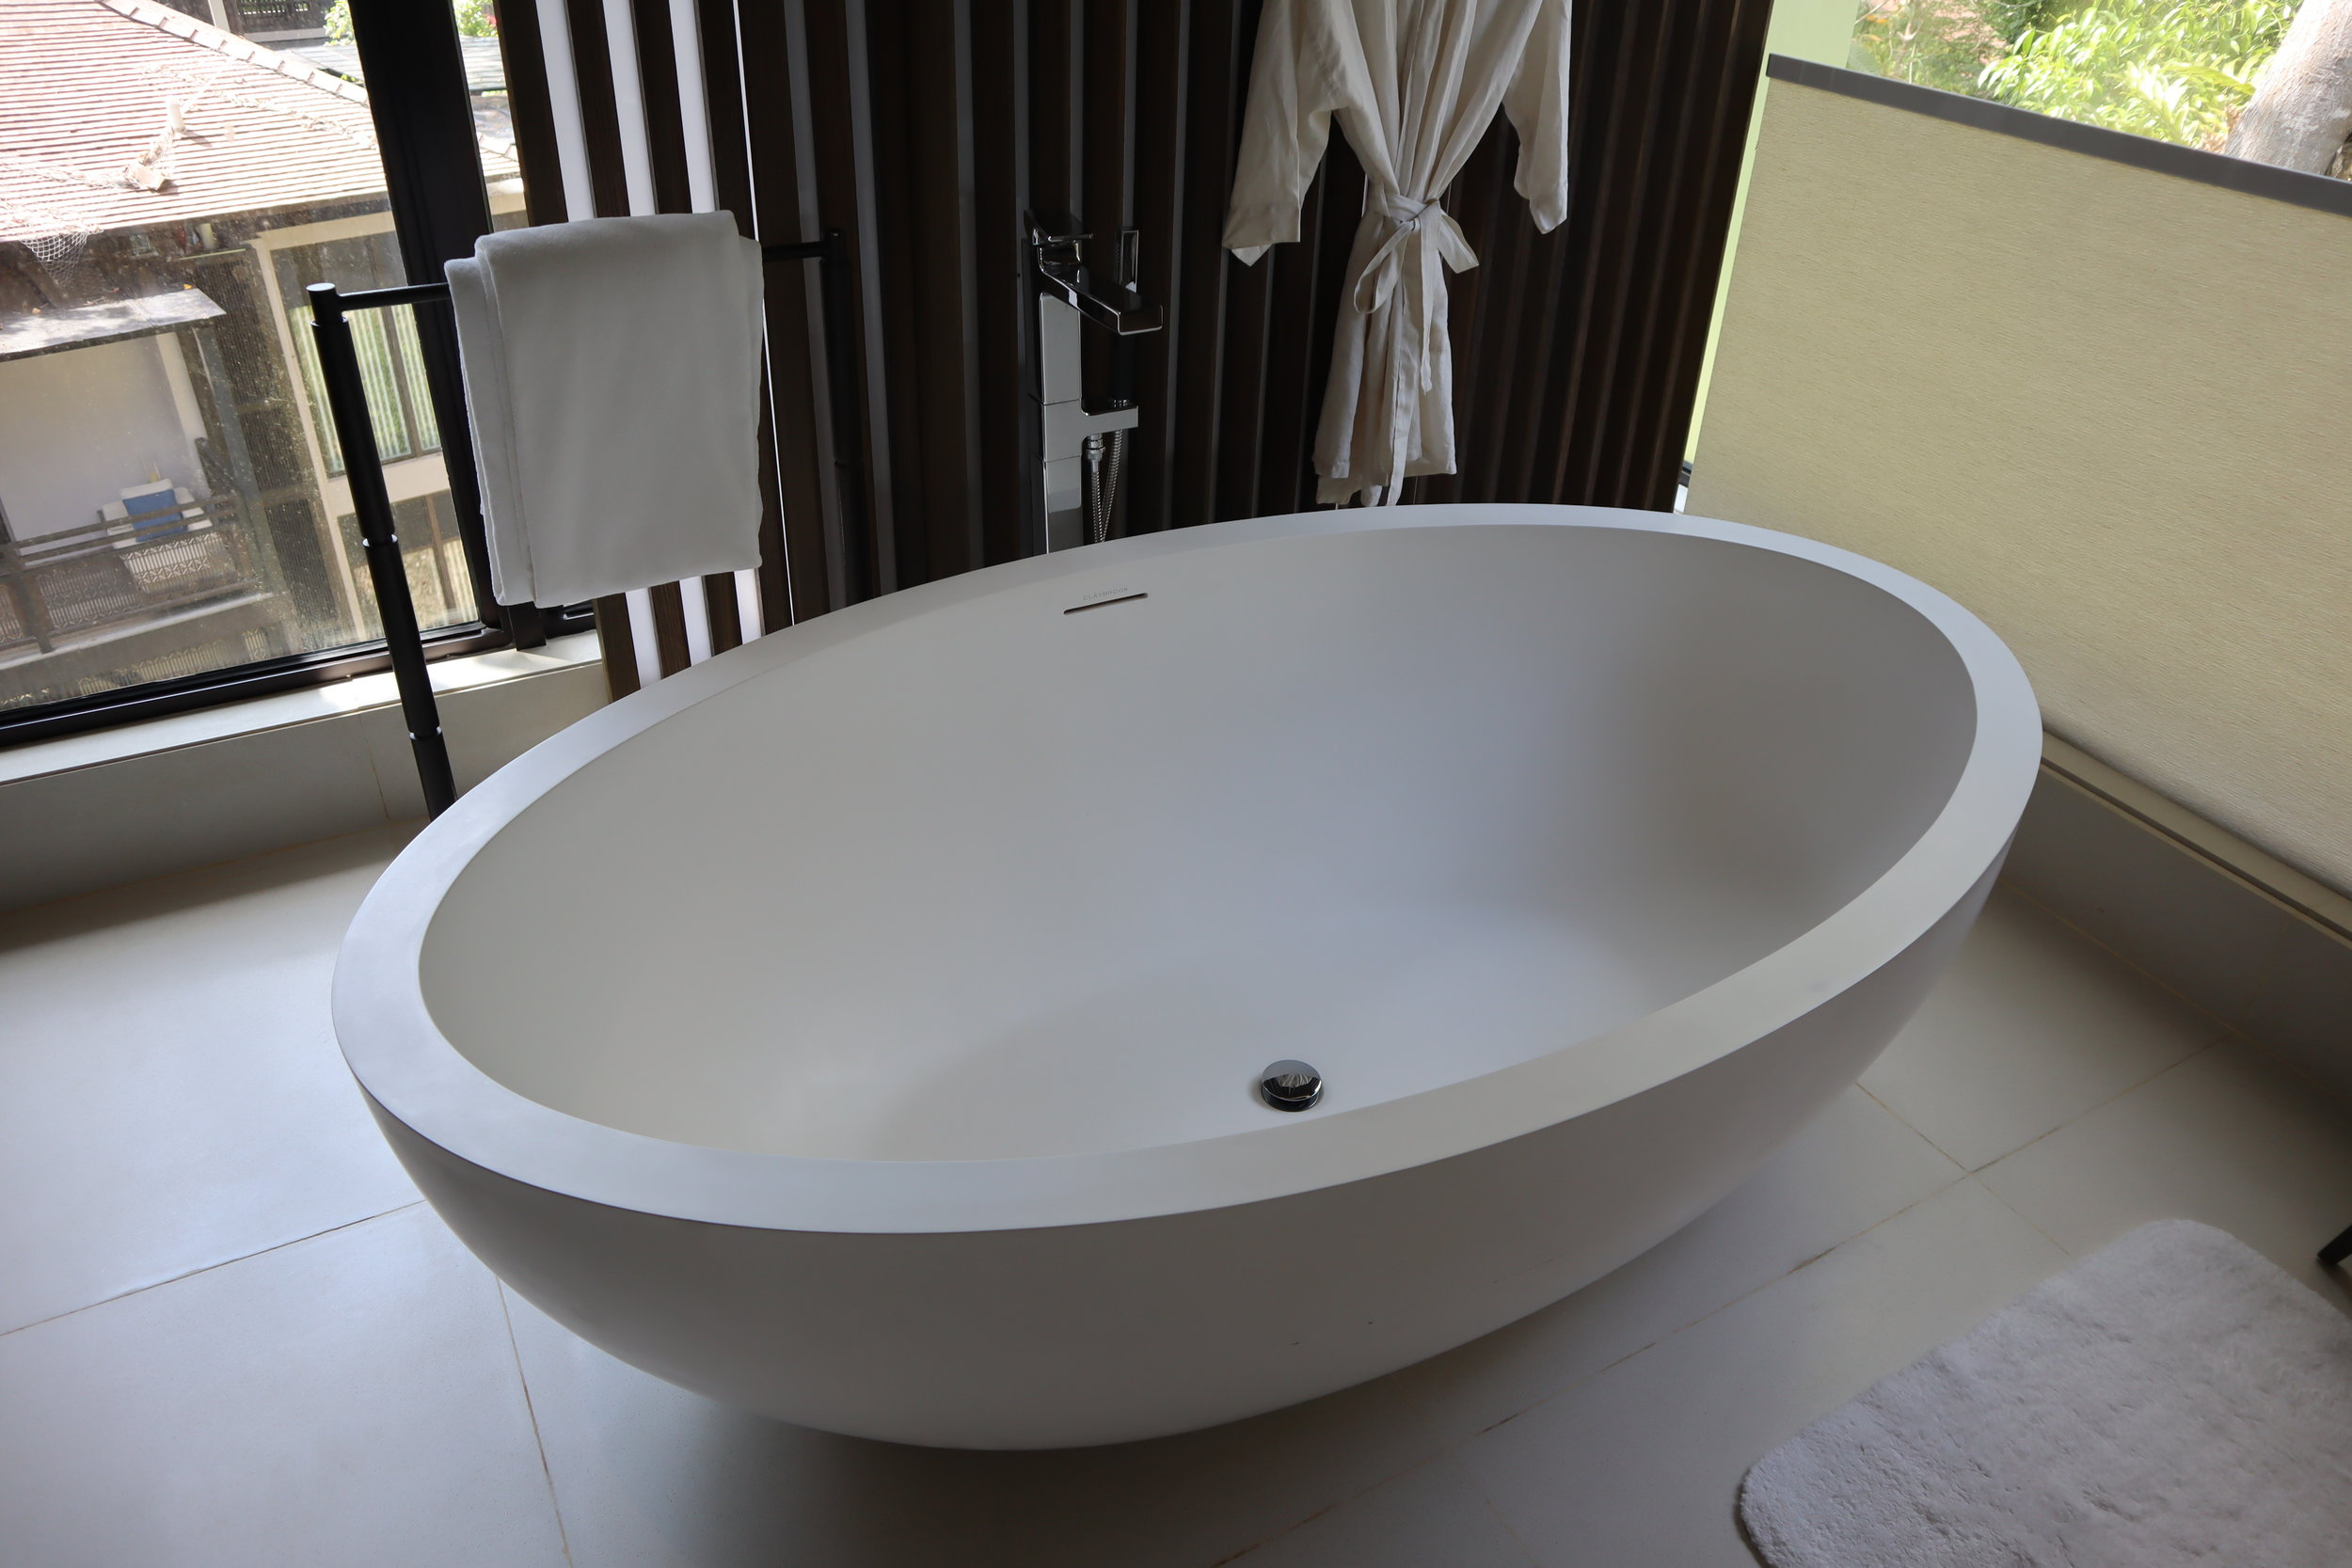 The Ritz-Carlton, Langkawi – Rainforest Junior Suite bathtub